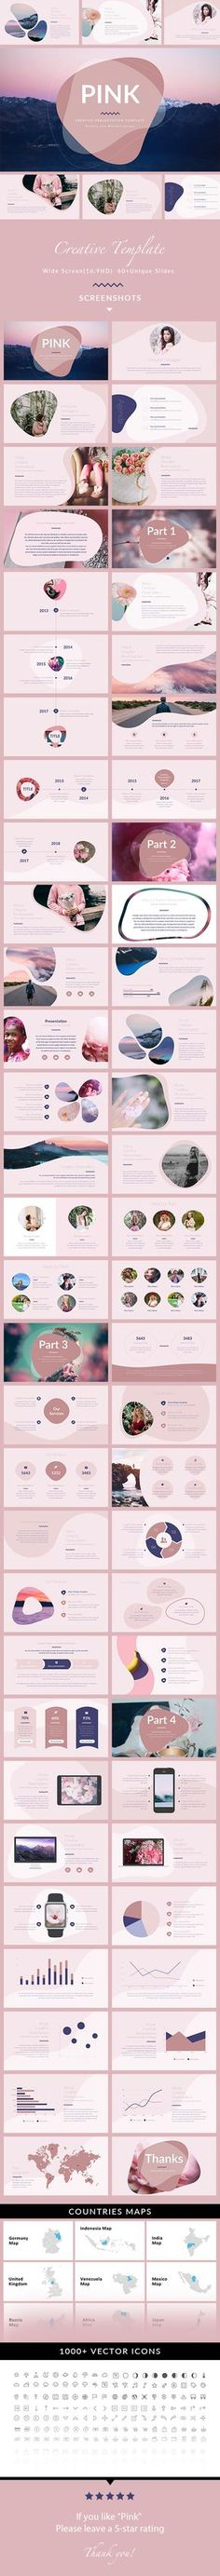 Pink Minimal & Creative Keynote Template — Keynote KEY #1920x1080 #modern • Download ➝ https://graphicriver.net/item/pink-minimal-creative-keynote-template/20321940?ref=pxcr